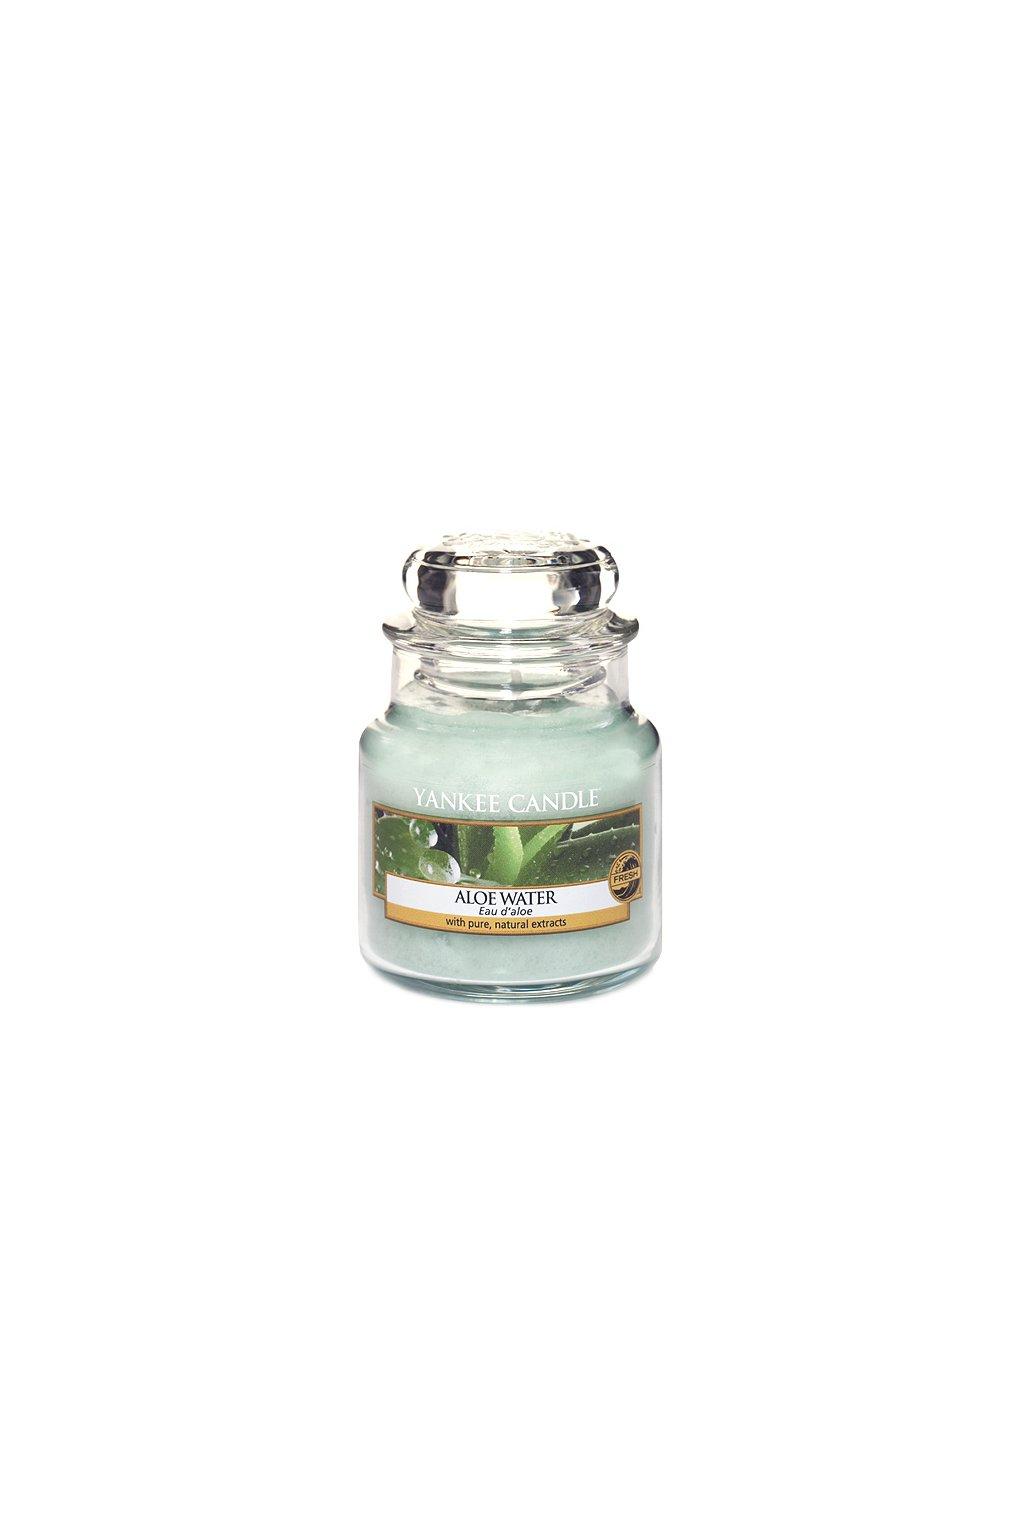 Yankee Candle Aloe Water 104g